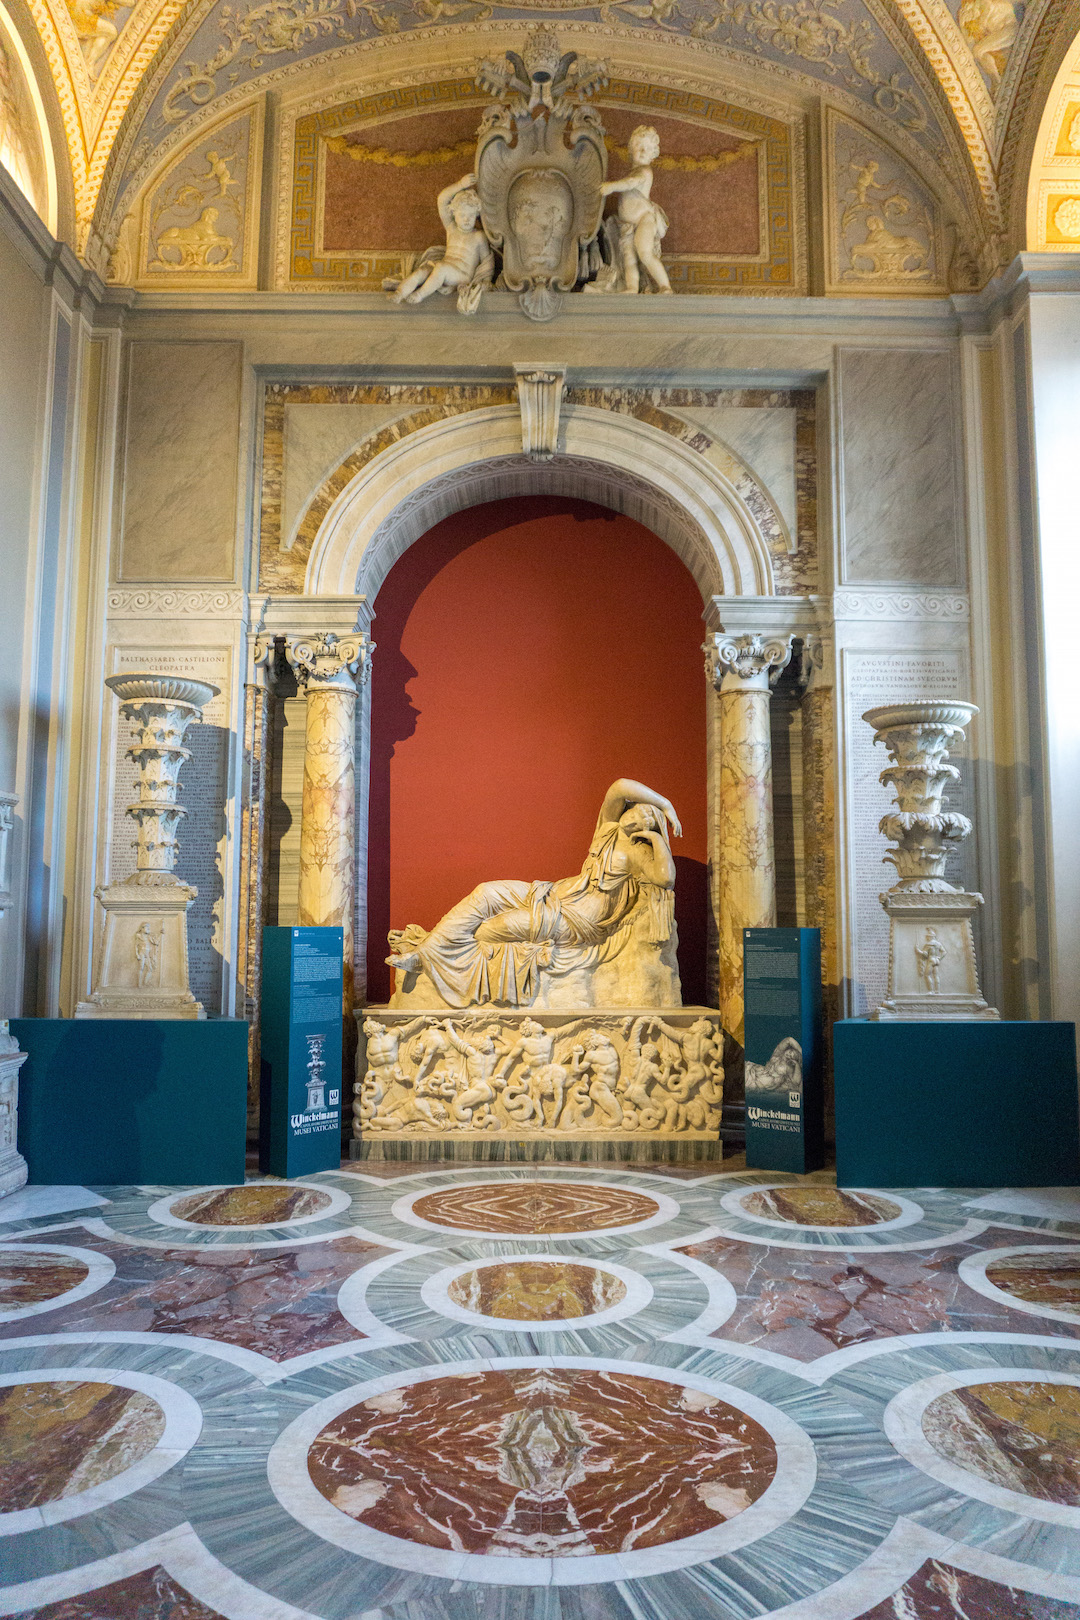 Her_Travel_Edit_Rome_Vatican_Museum